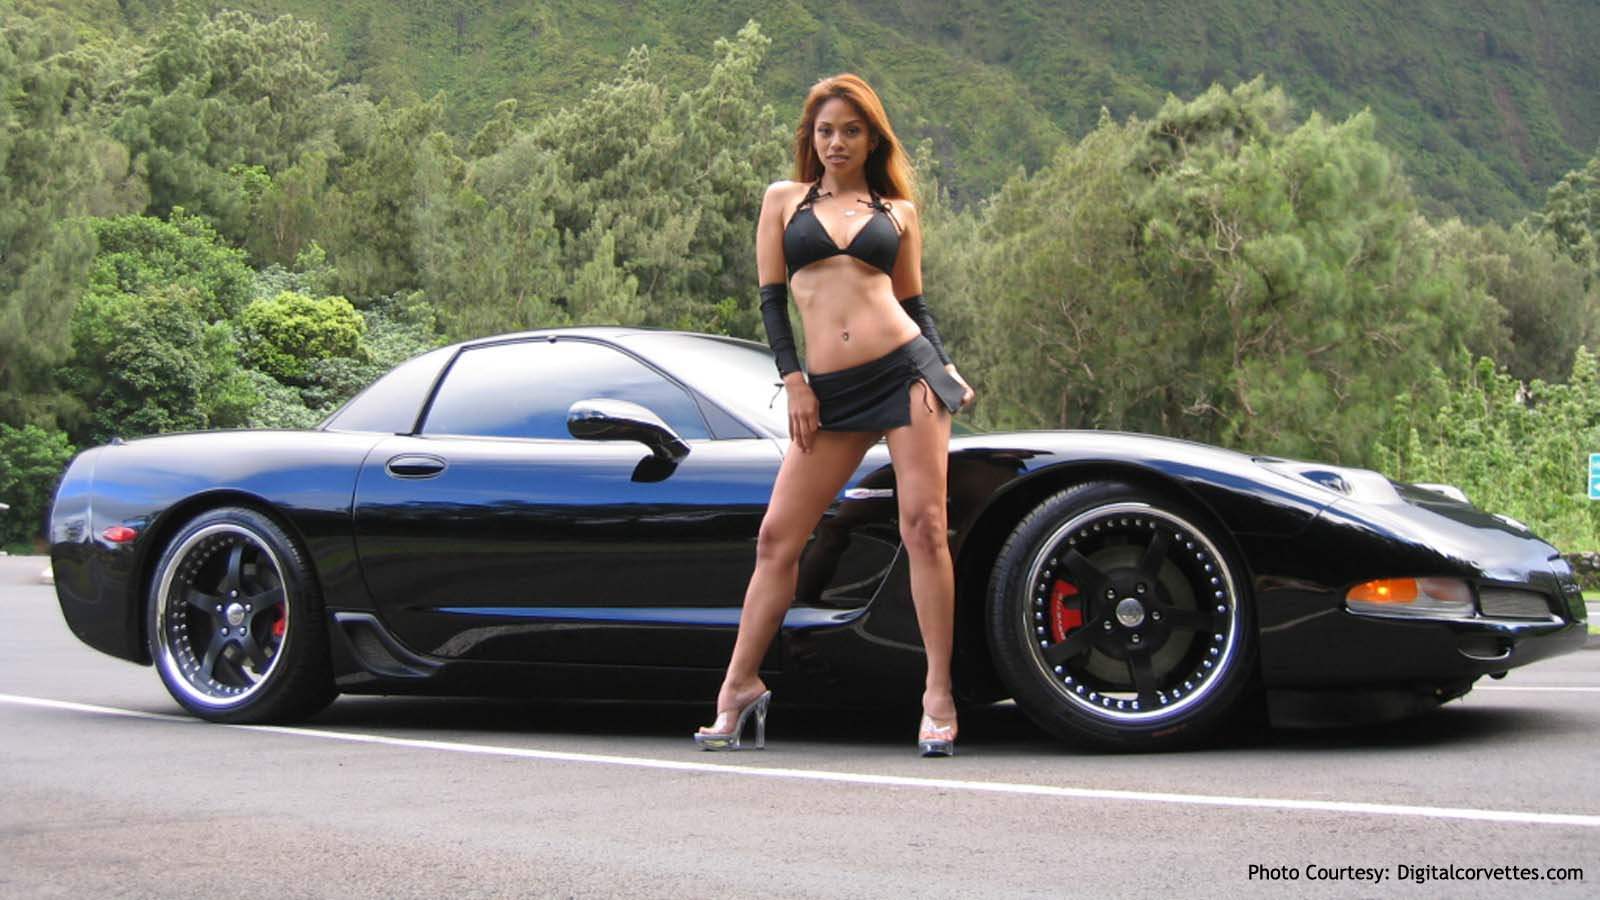 Corvette in Nature